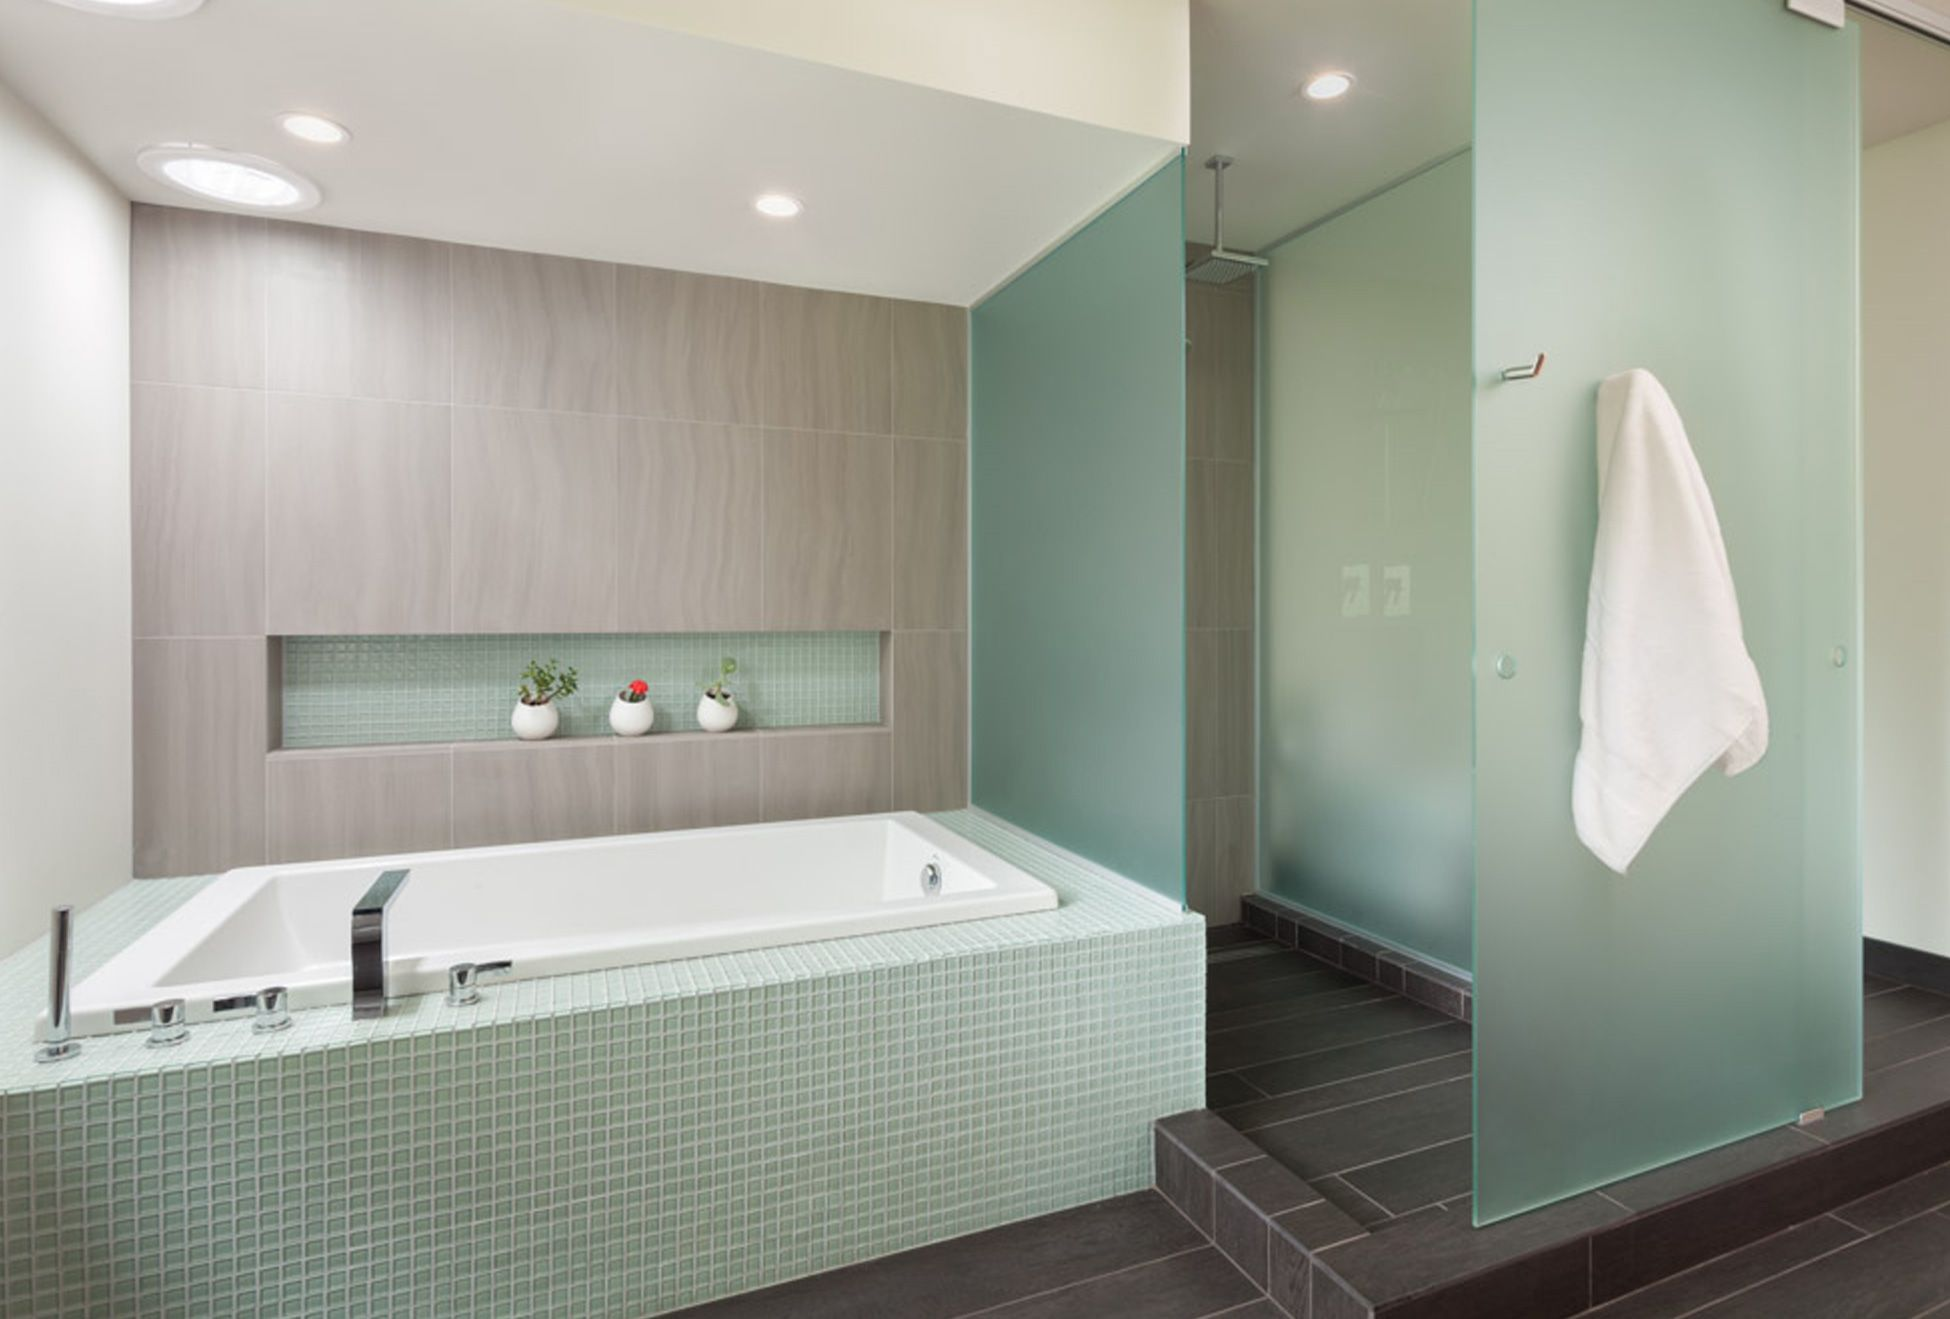 Boulder Modern Home Remodel - HMH Architecture + Interiors ...